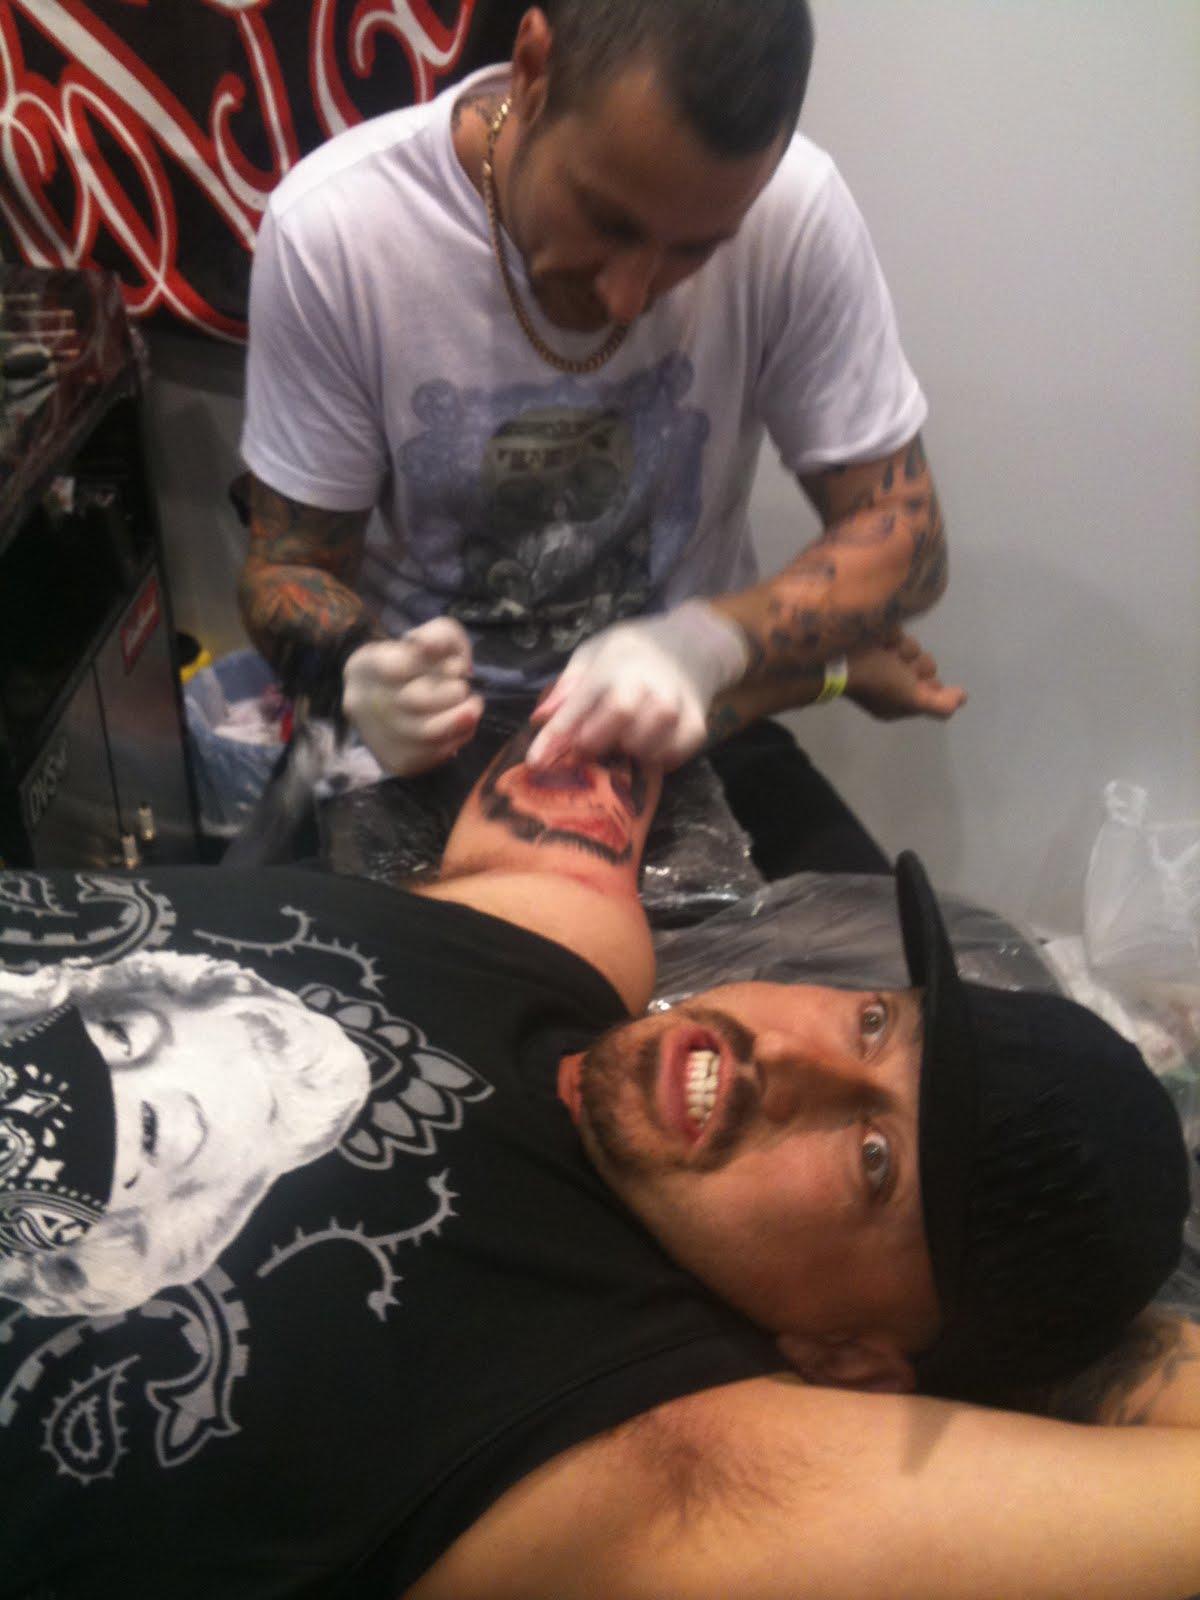 Surf n ink tattoo show